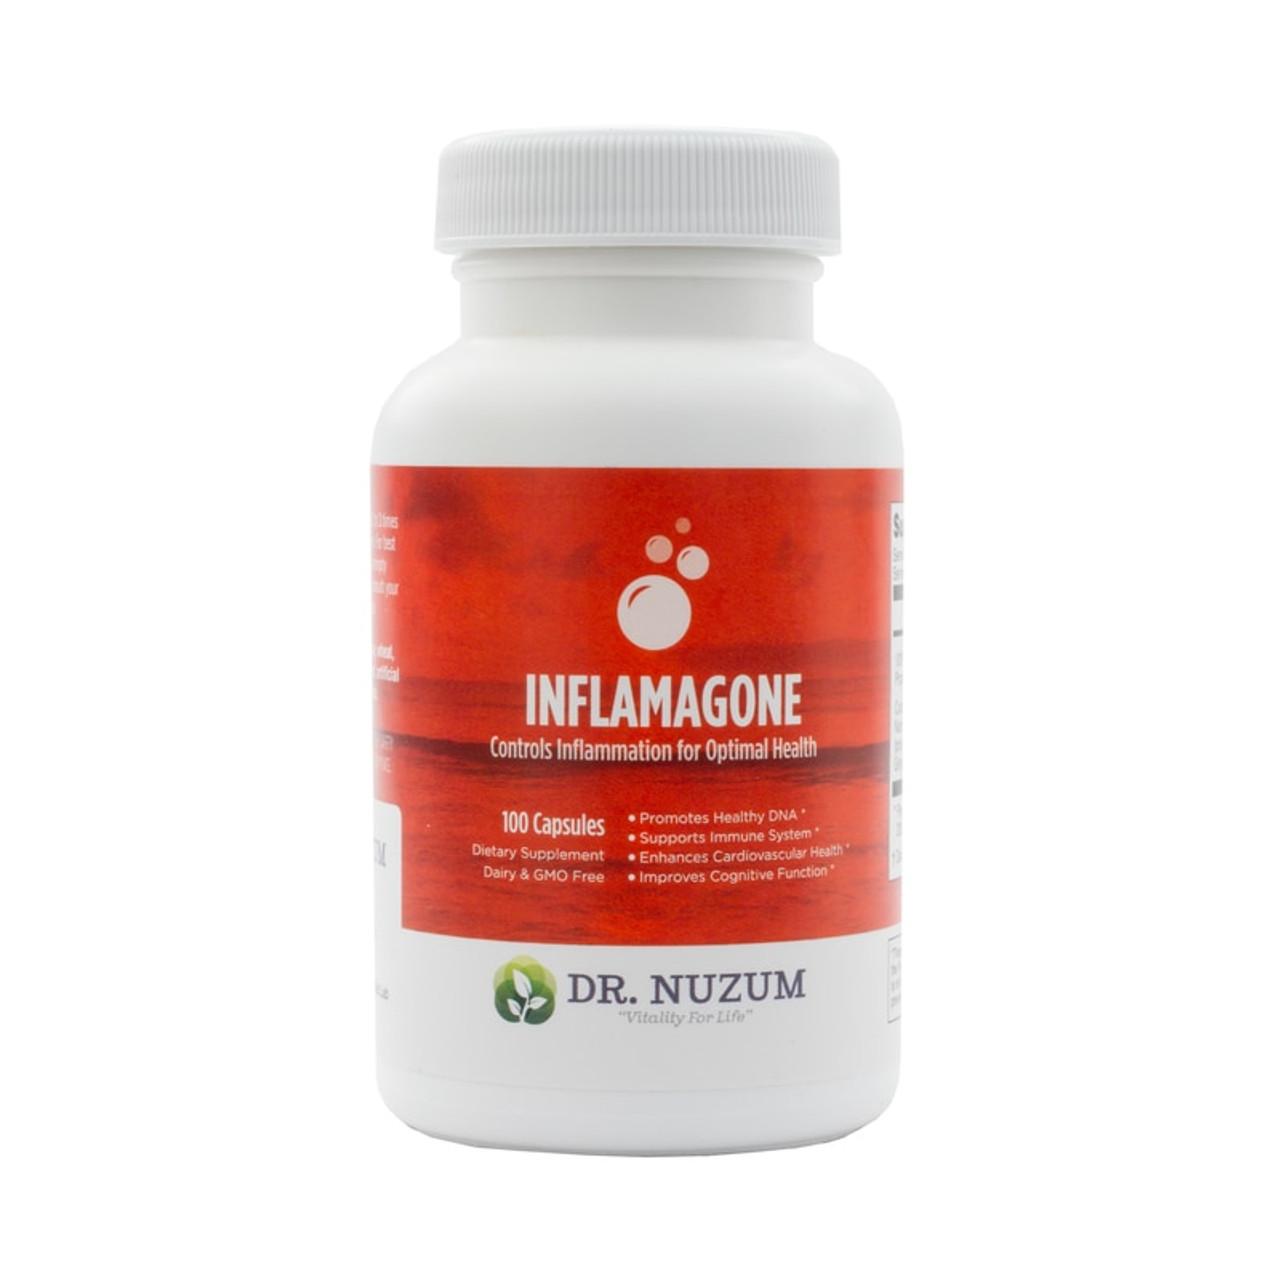 Inflamagone